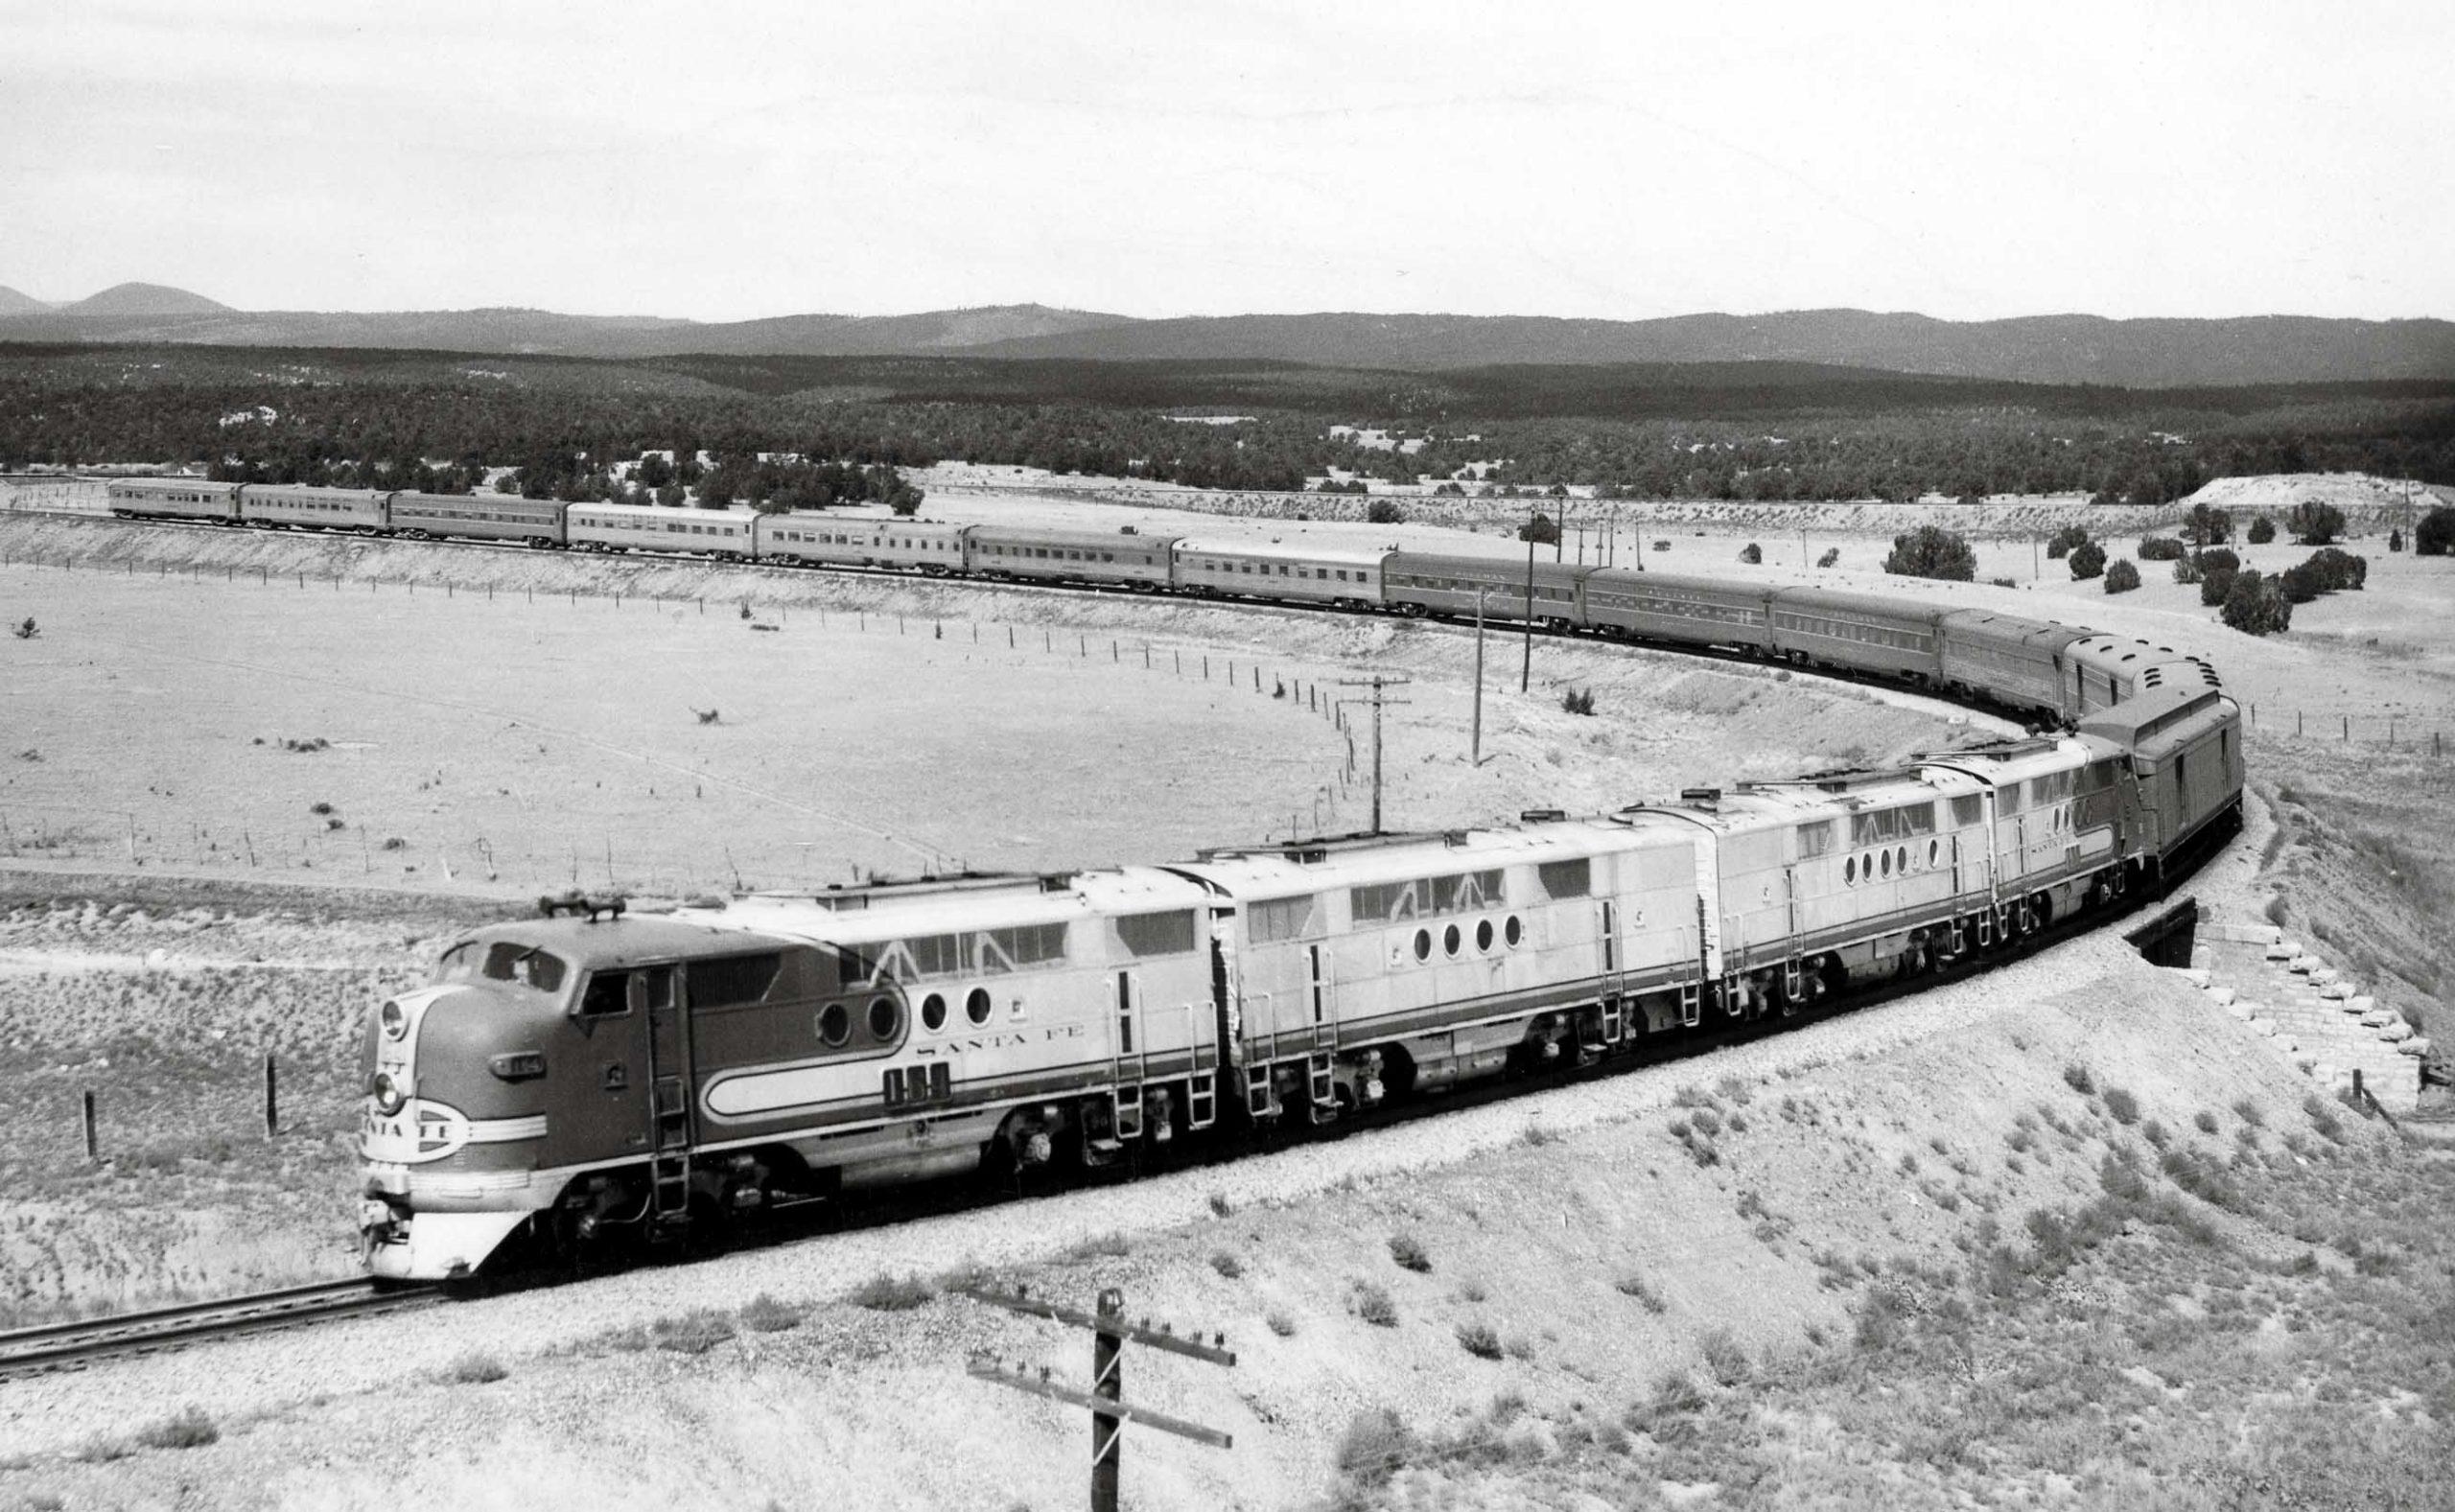 Rear of Santa Fe Chief passenger train